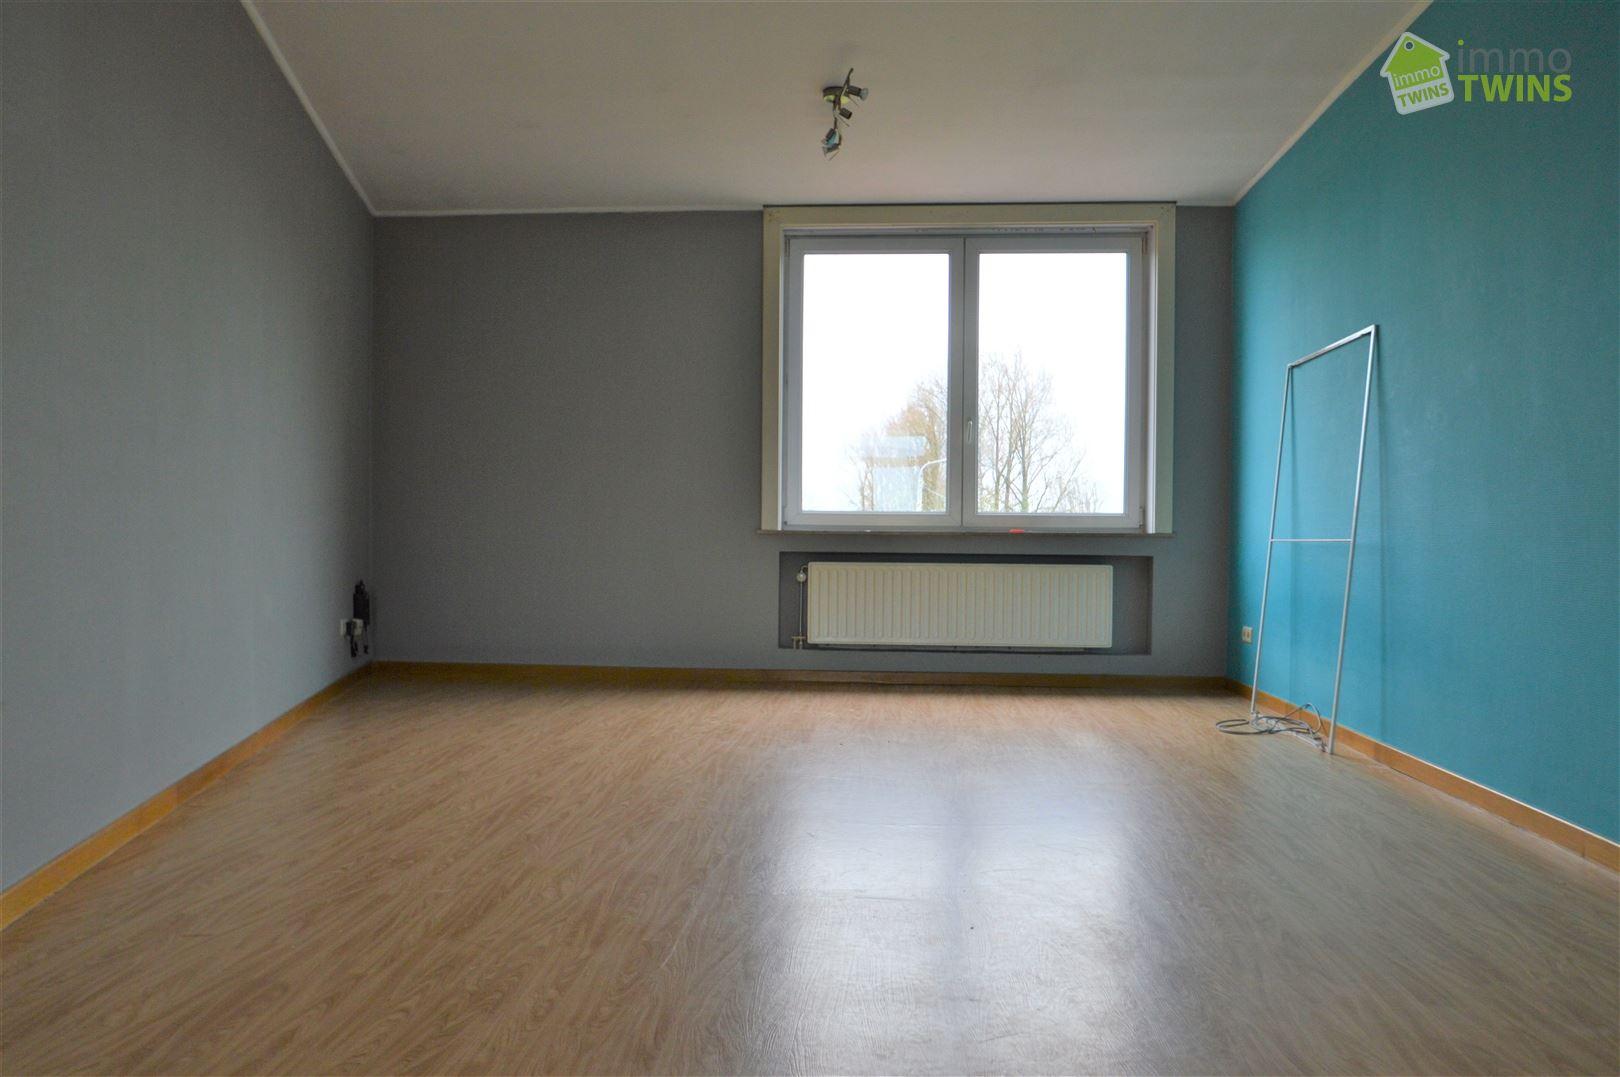 Foto 2 : Appartement te 9200 DENDERMONDE (België) - Prijs € 575